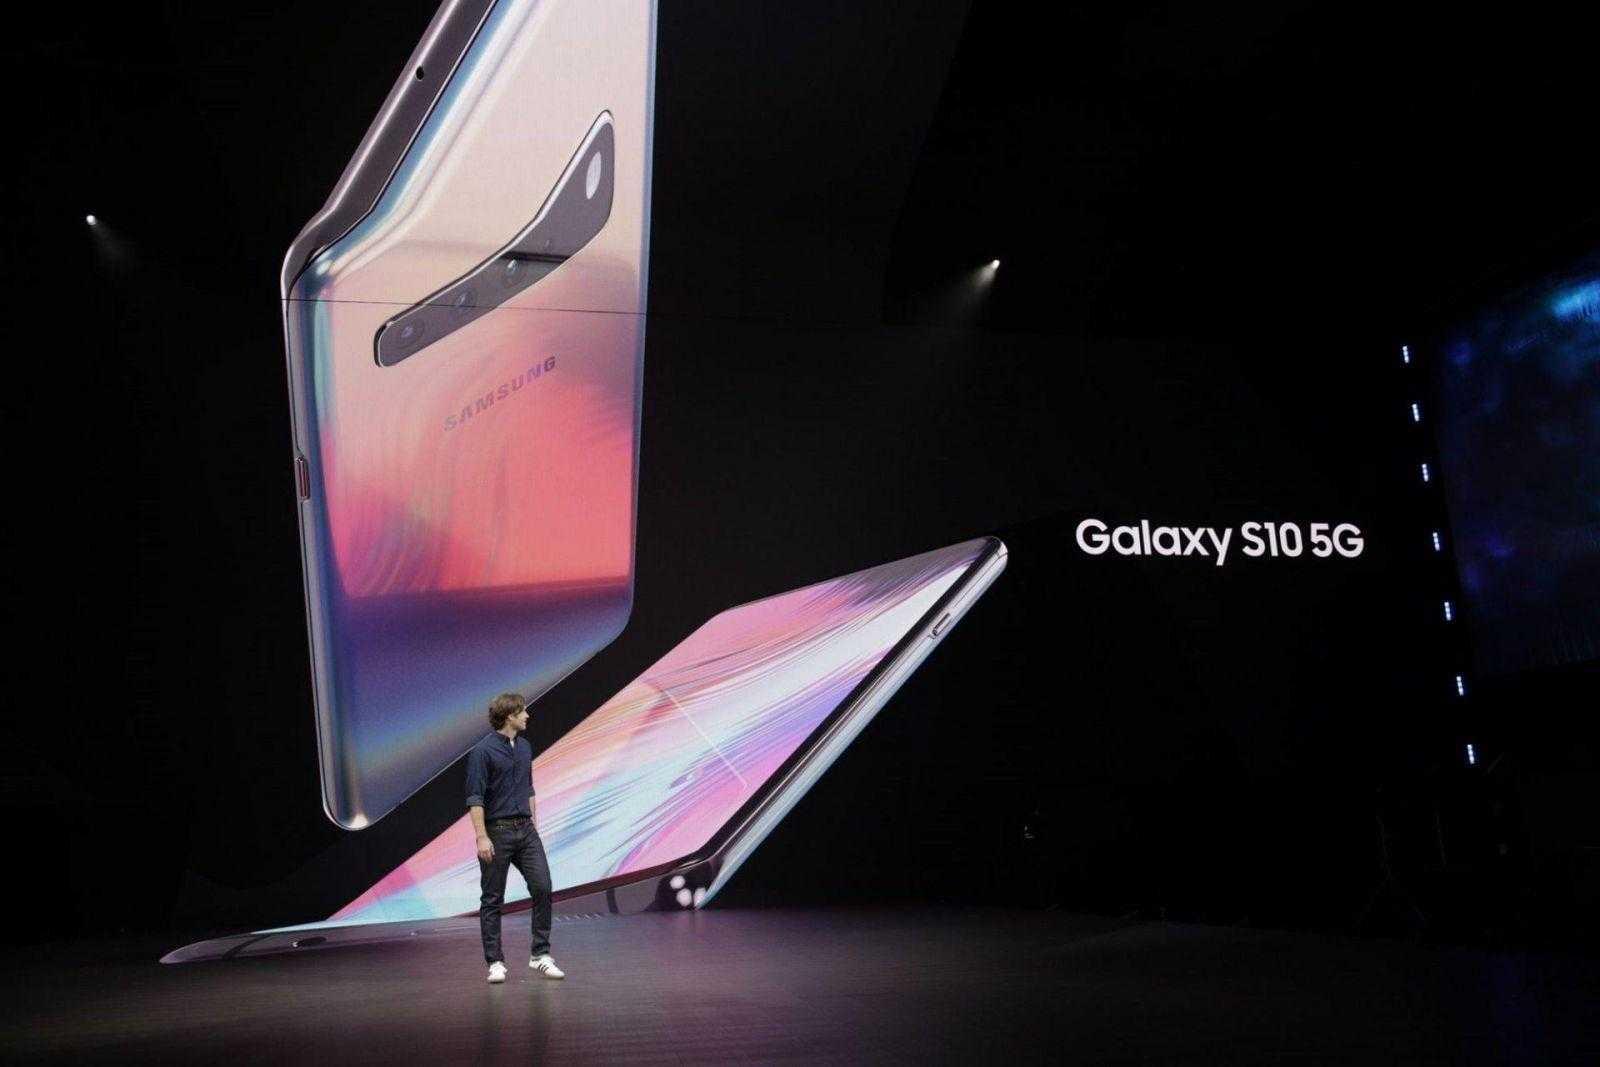 Samsung показал самый мощный смартфон Galaxy S10 5G (lcimg 6e72dd14 c5fb 4d48 b689 7183091daa6e)